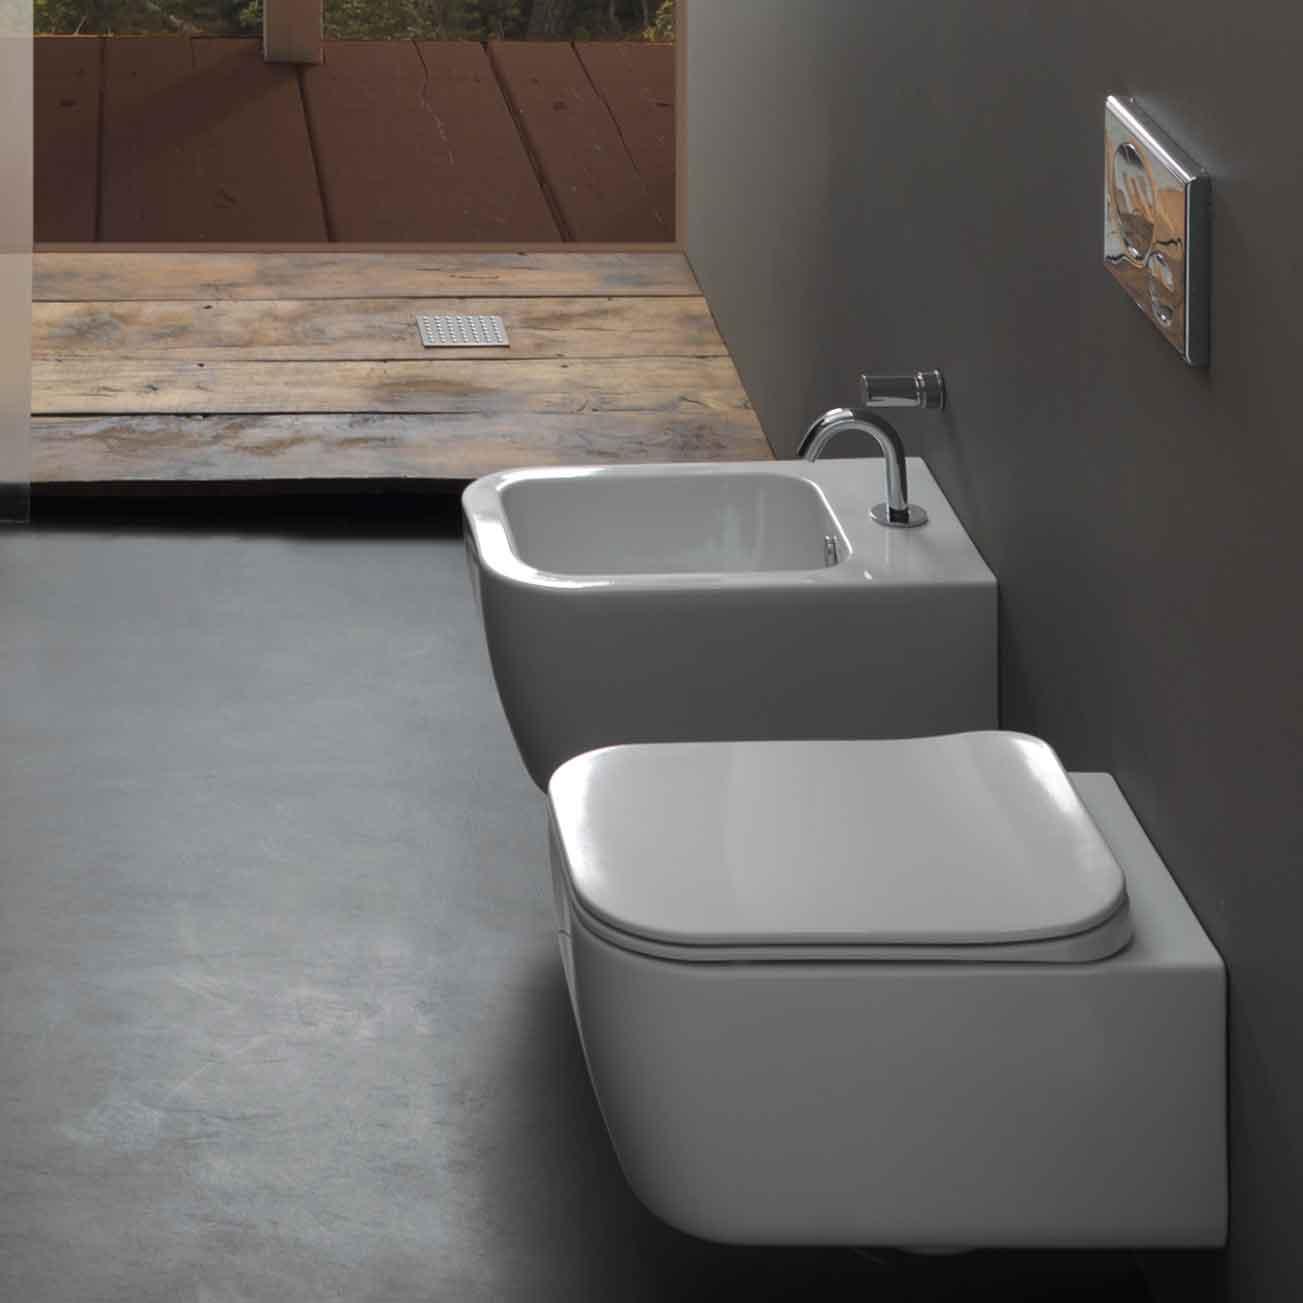 Sanitari sospesi senza brida Bring con sedile soft close a sgancio rapido e sistema Smart Clean